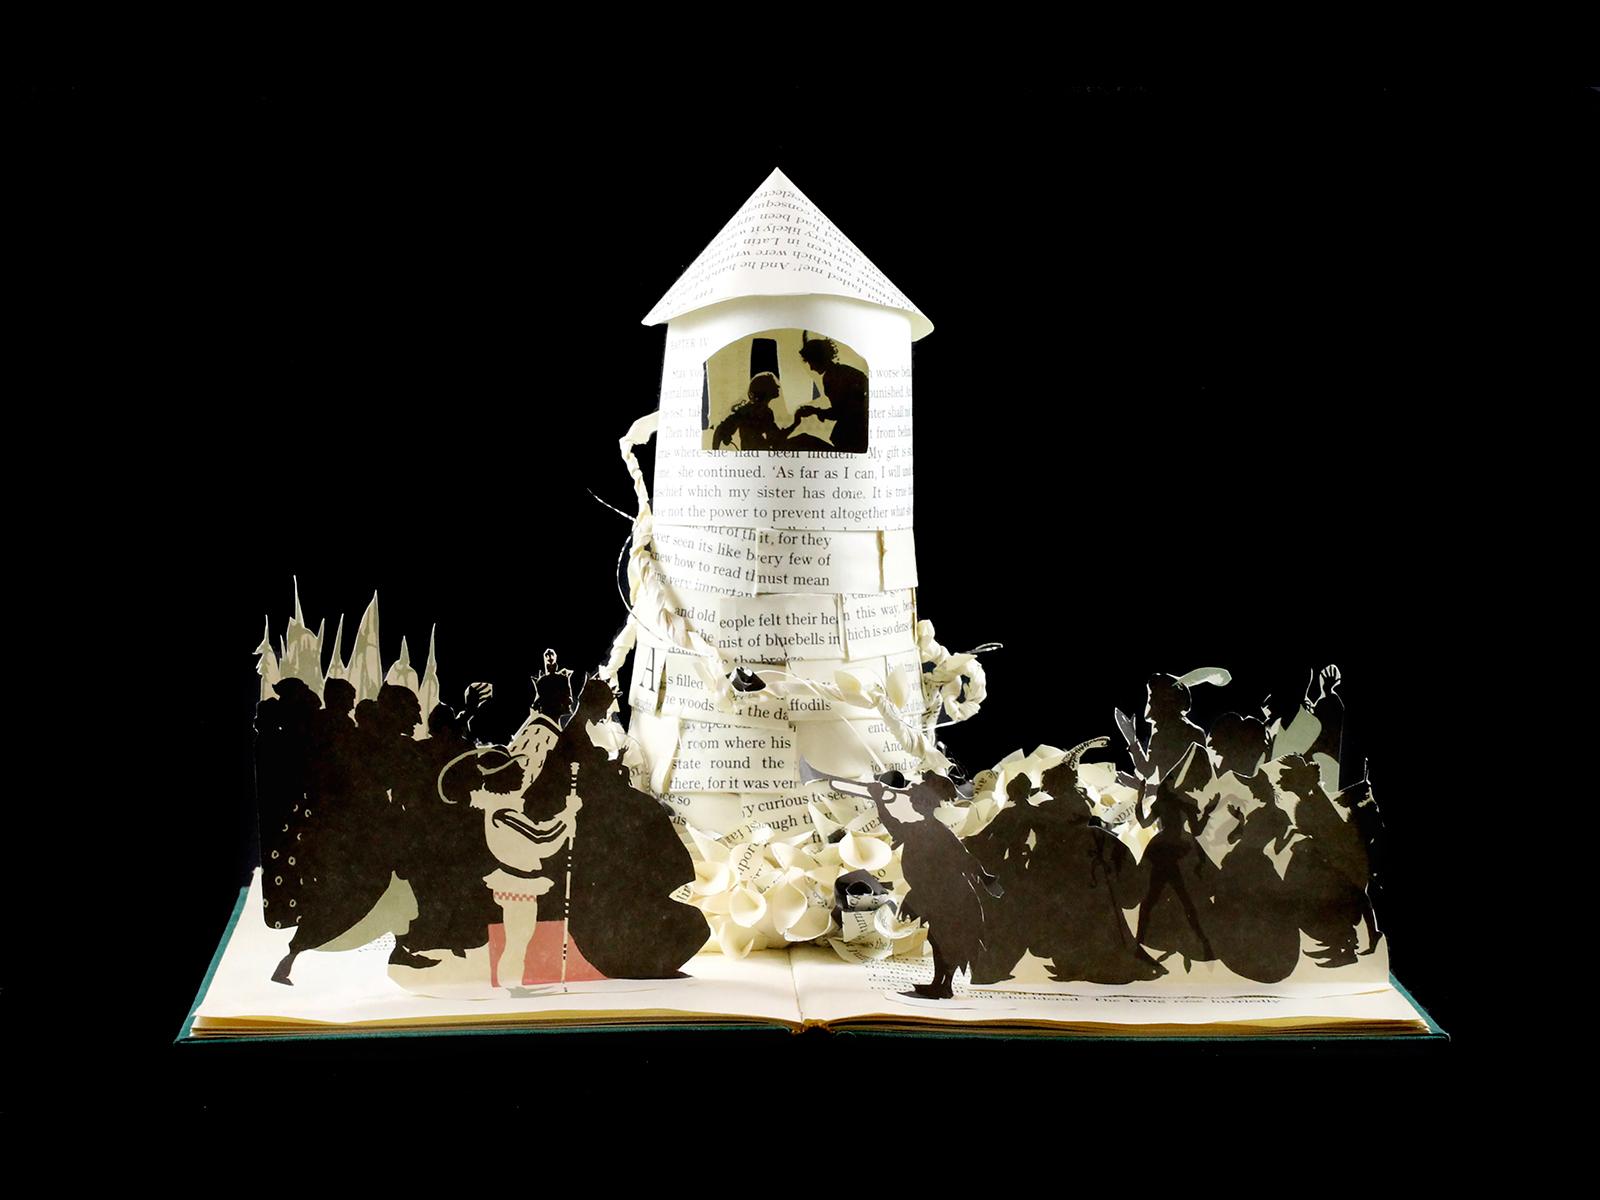 Sleeping Beauty book sculpture by jamie b. hannigan